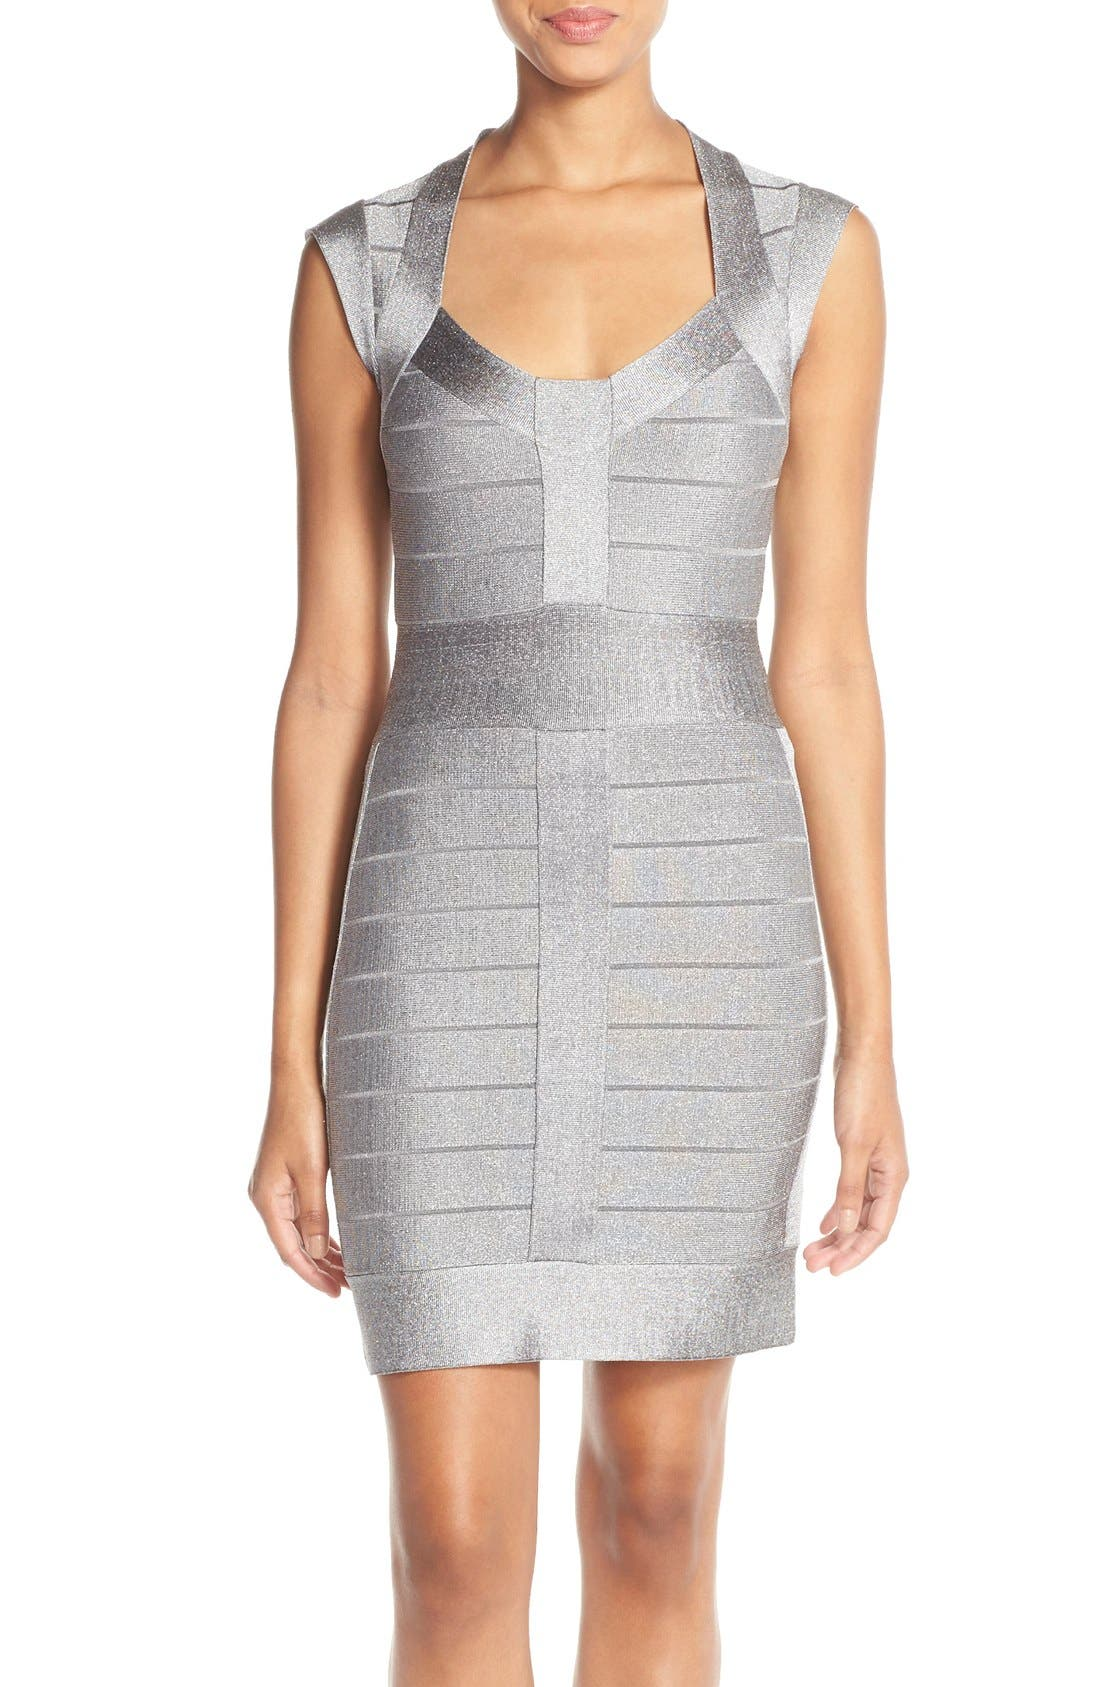 Main Image - French Connection Metallic Knit Bandage Dress